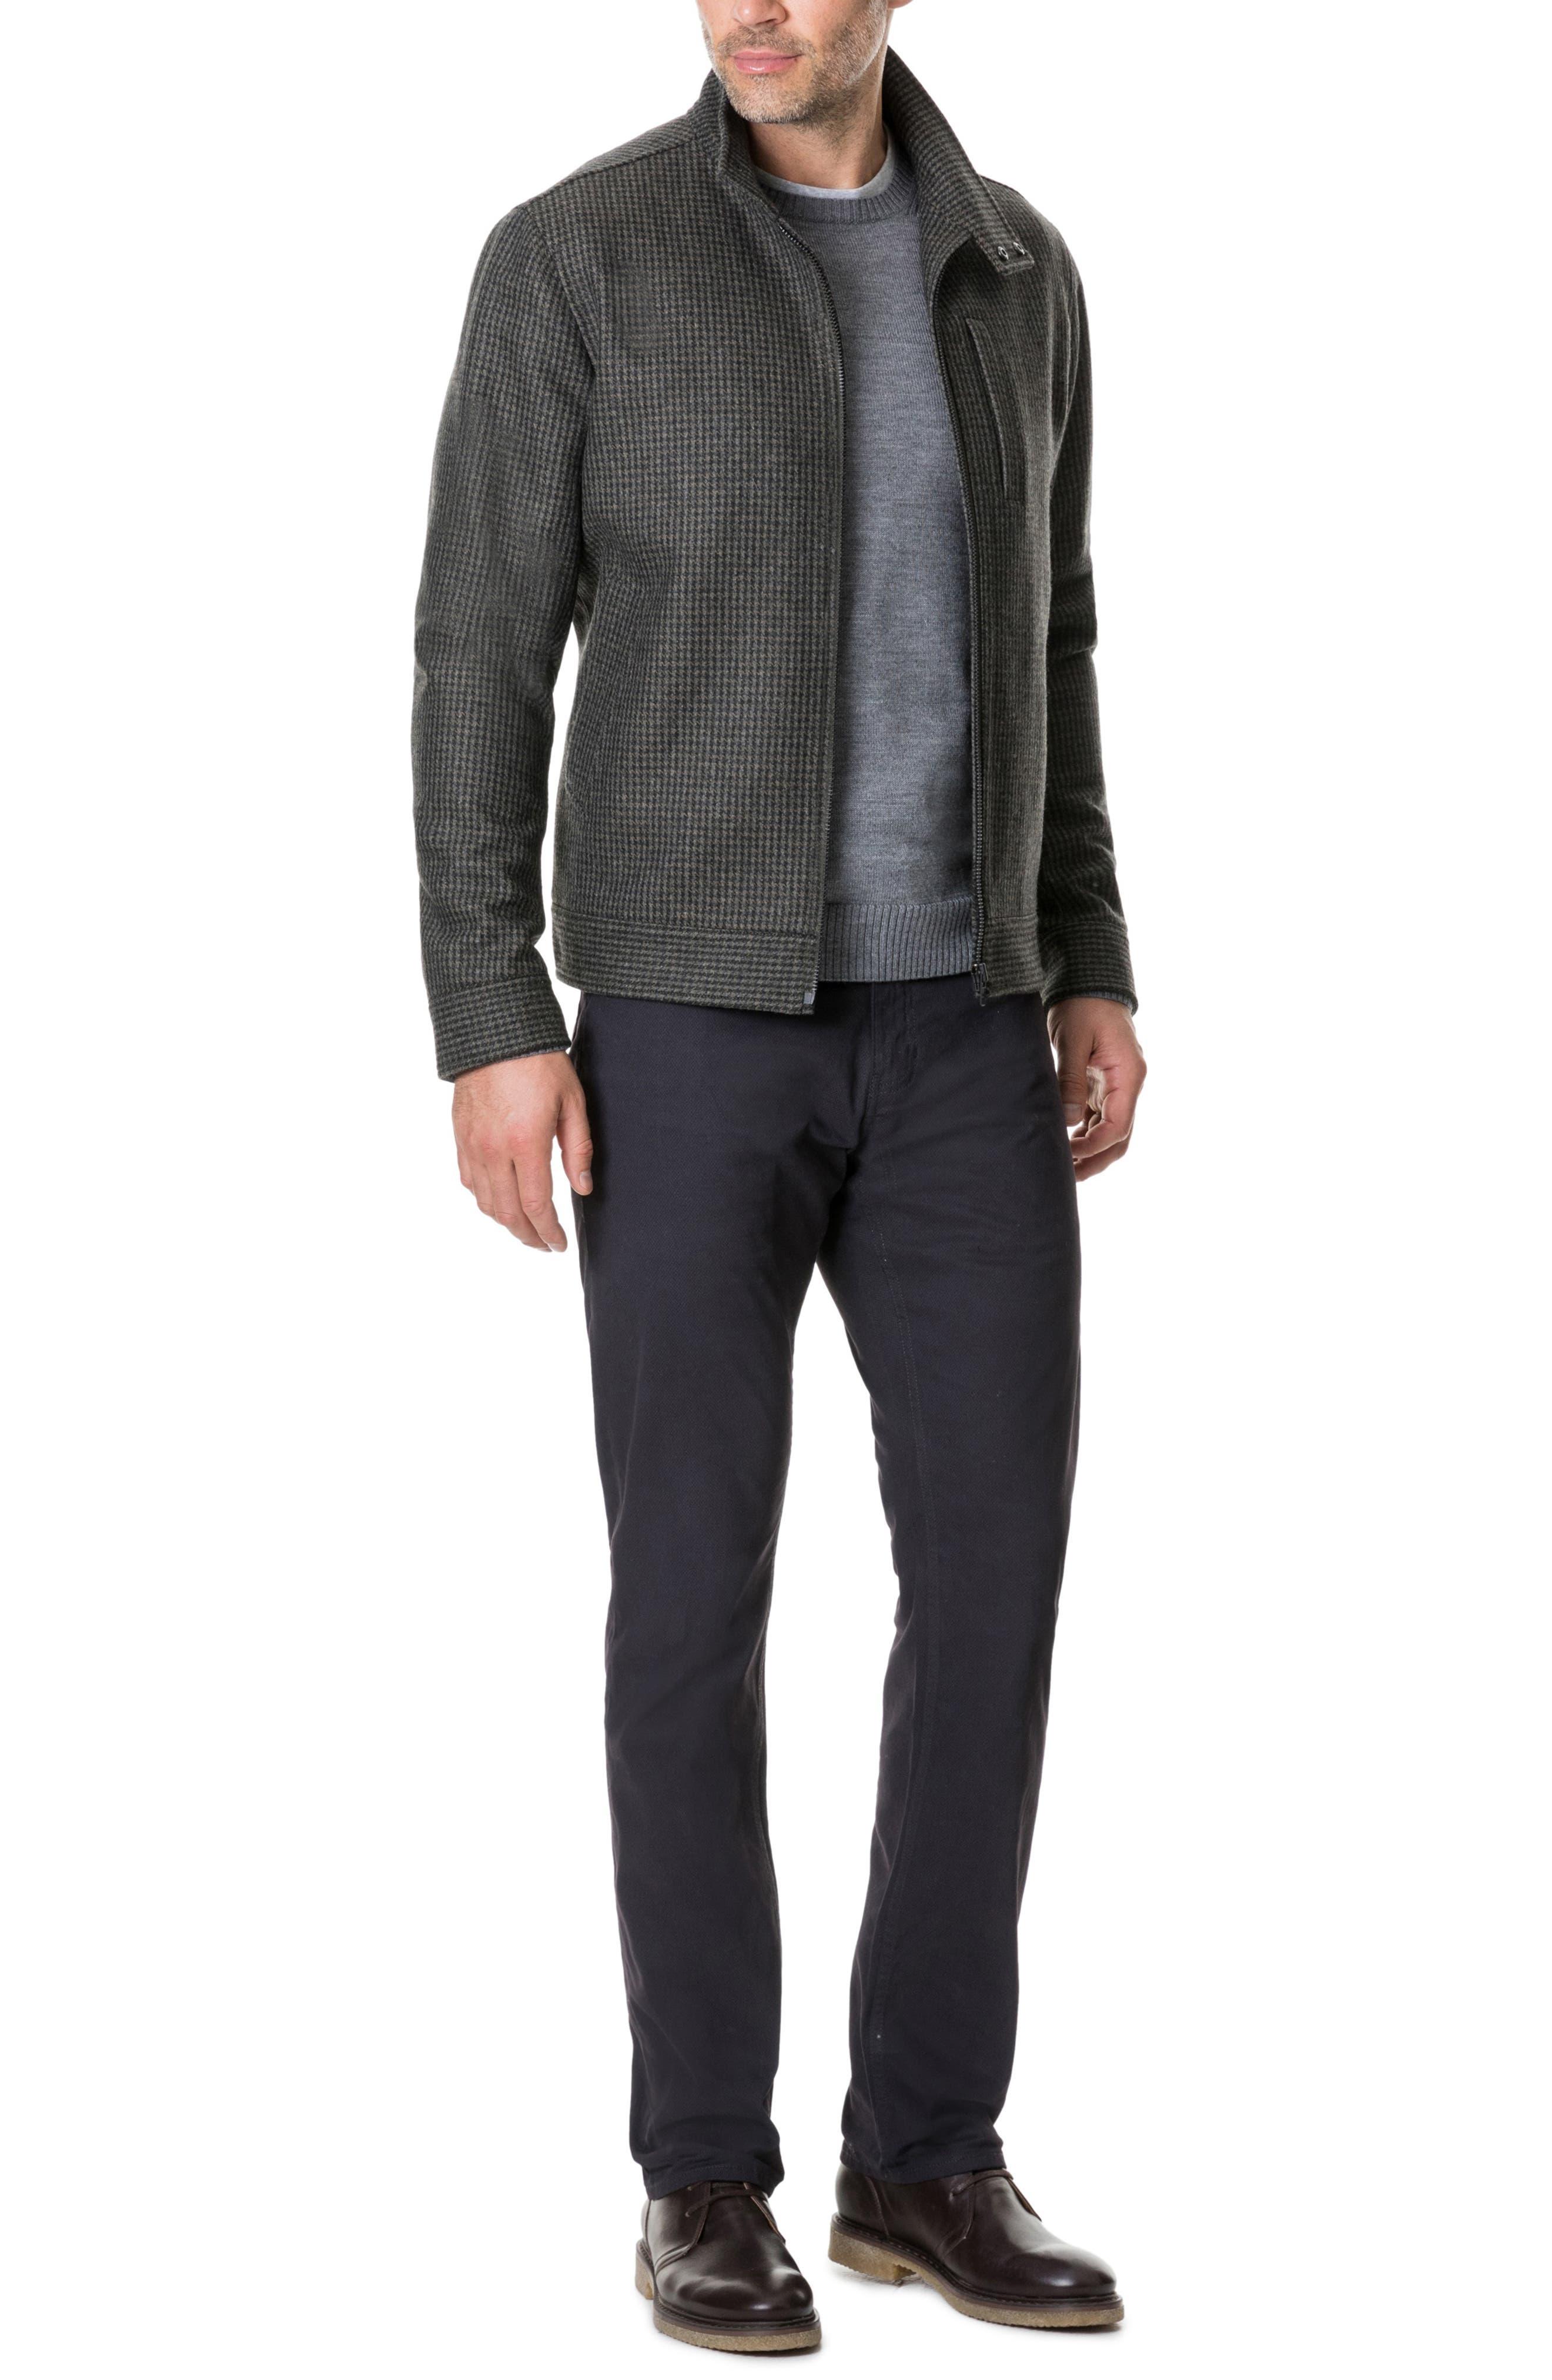 Oyster Cove Regular Fit Wool Blend Jacket,                             Alternate thumbnail 5, color,                             OLIVE